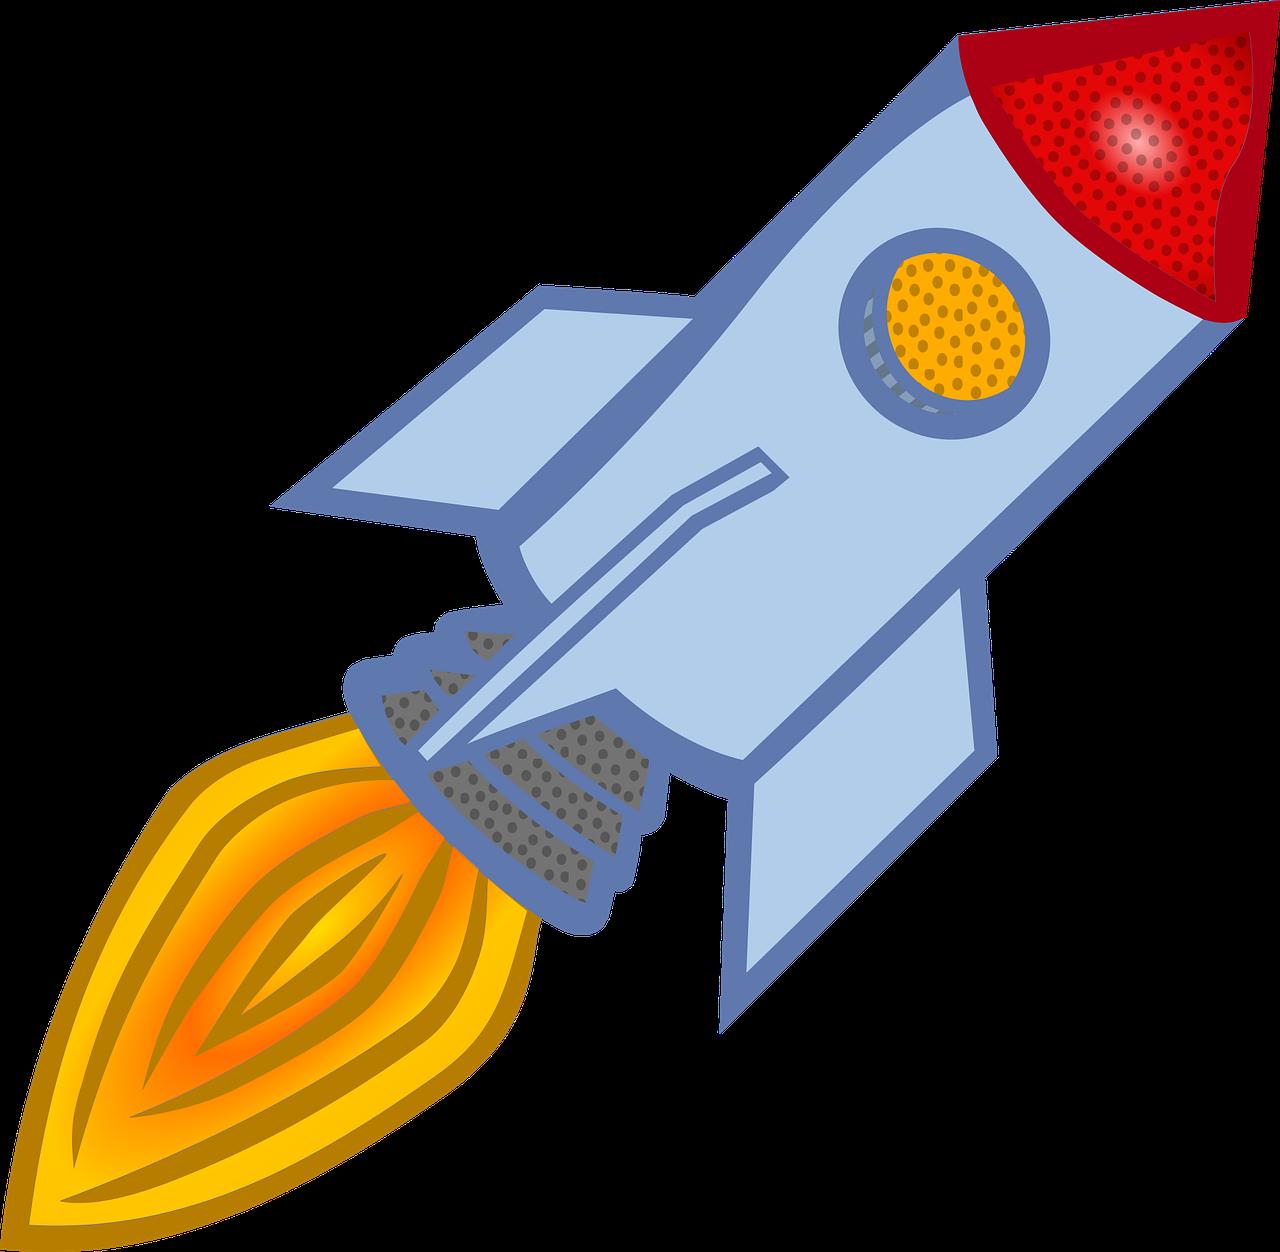 Proprcopy local seo content. Clipart rocket rocket booster